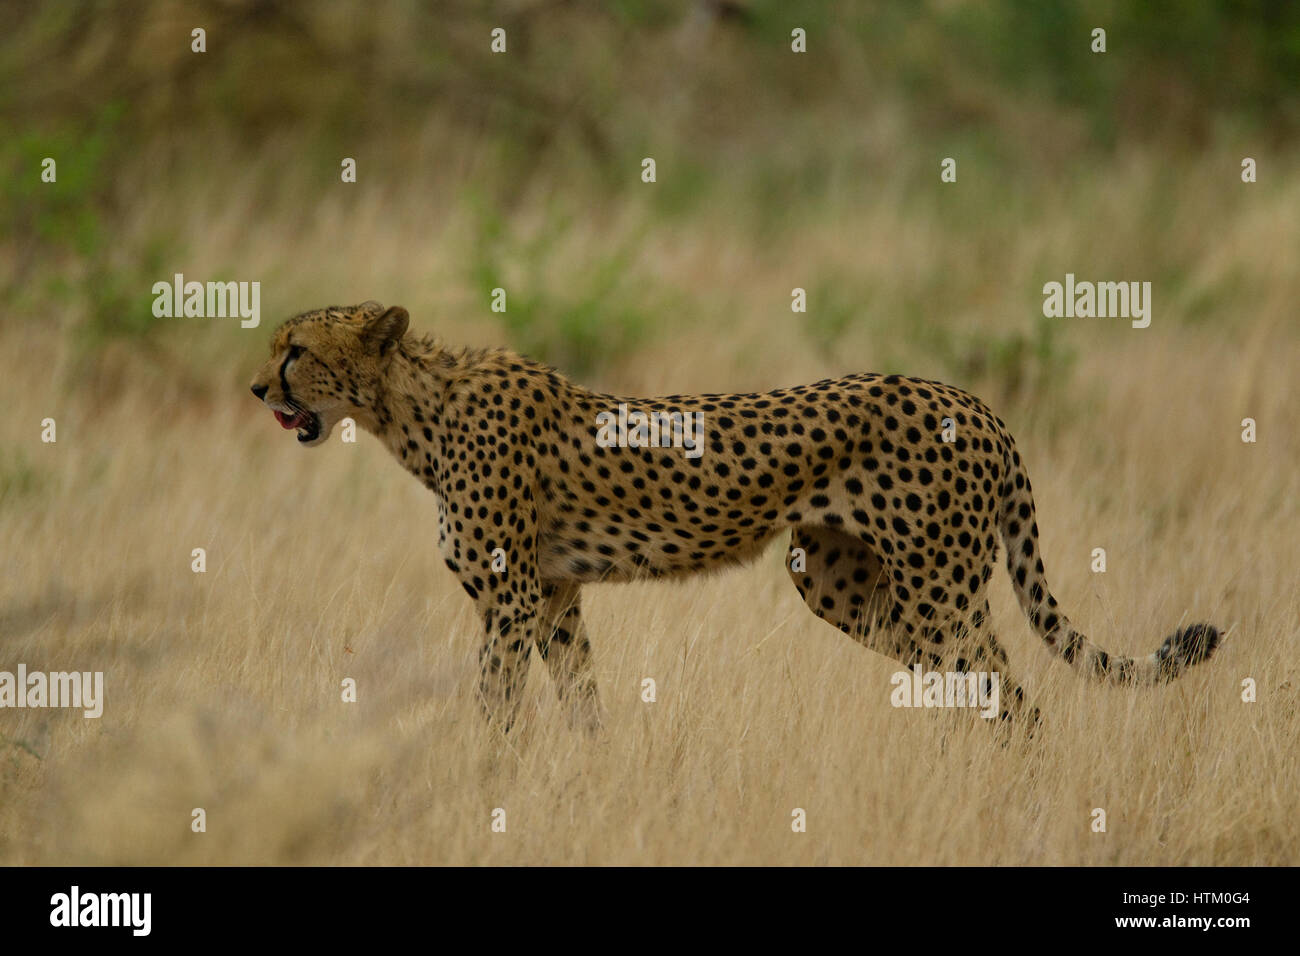 Male Cheetah (Acinonyx jubatus) on the hunt, Samburu National Reserve, Kenya, East Africa Stock Photo